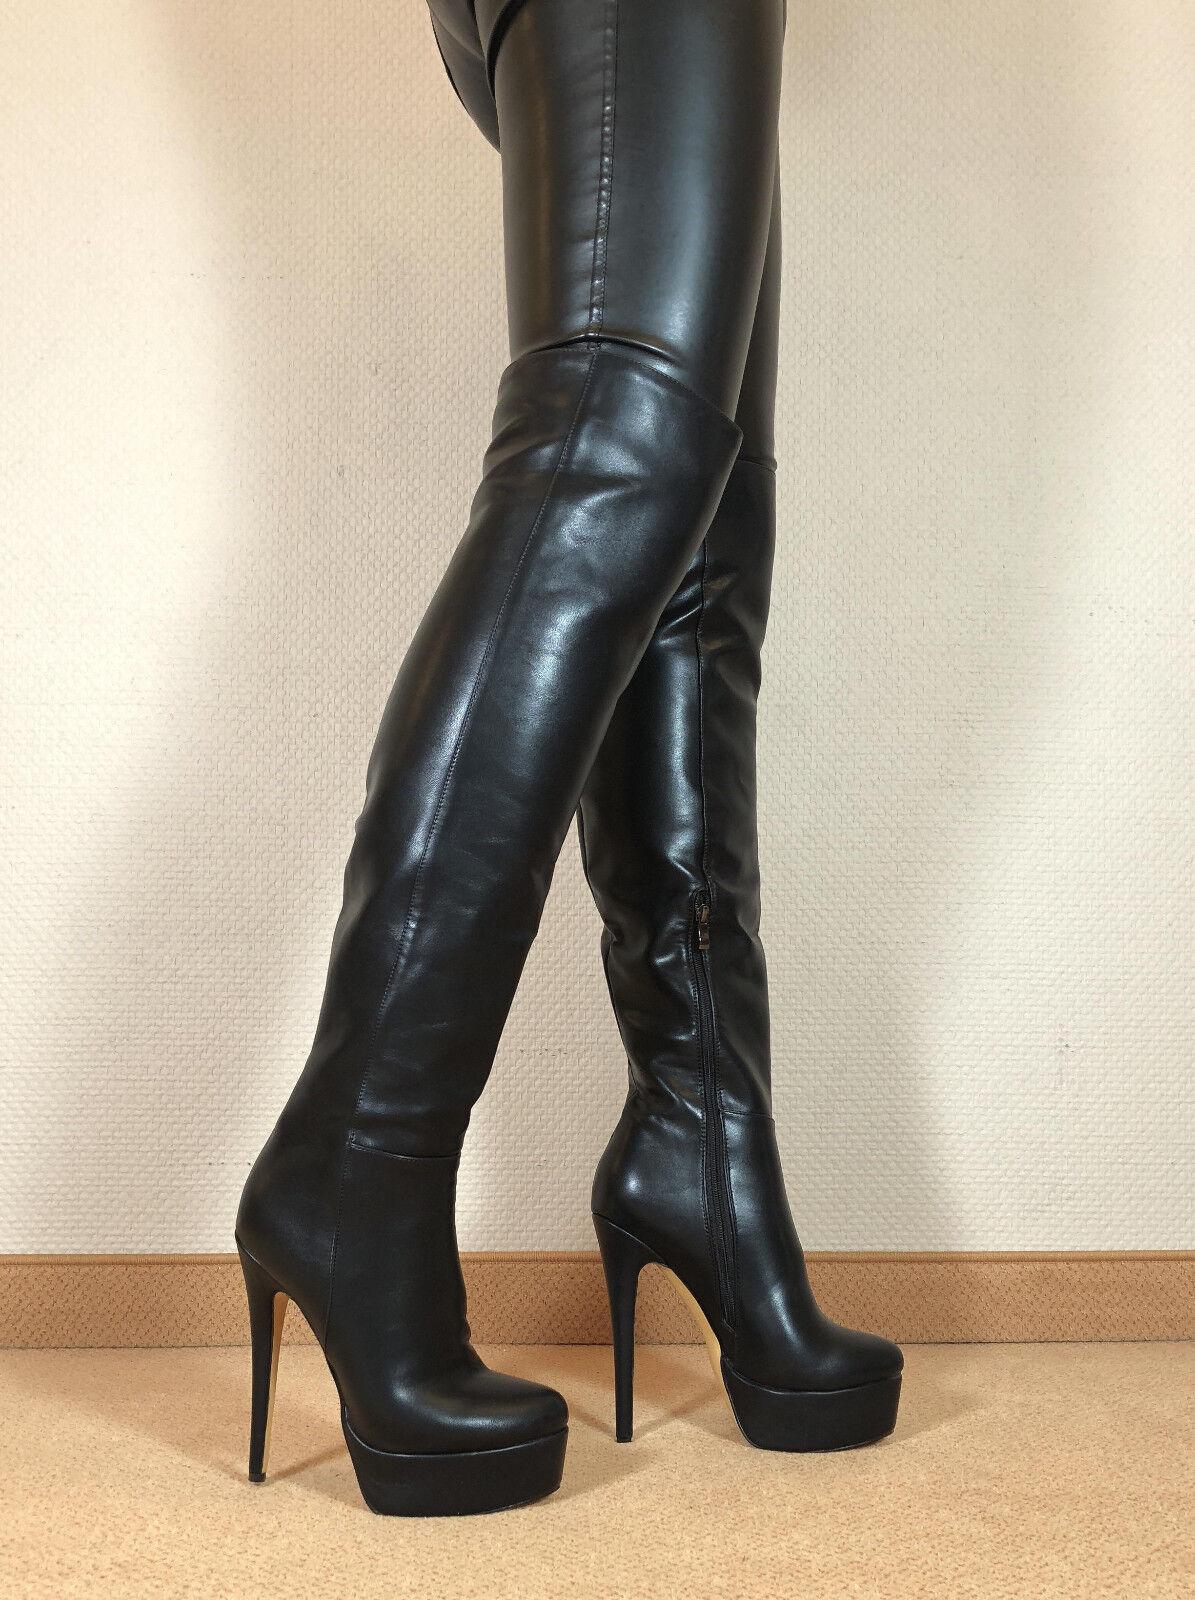 Talla 43 top  en exclusiva sexy sexy sexy zapatos señora botas altas Stiletto botas hombres botas d6 f49efe